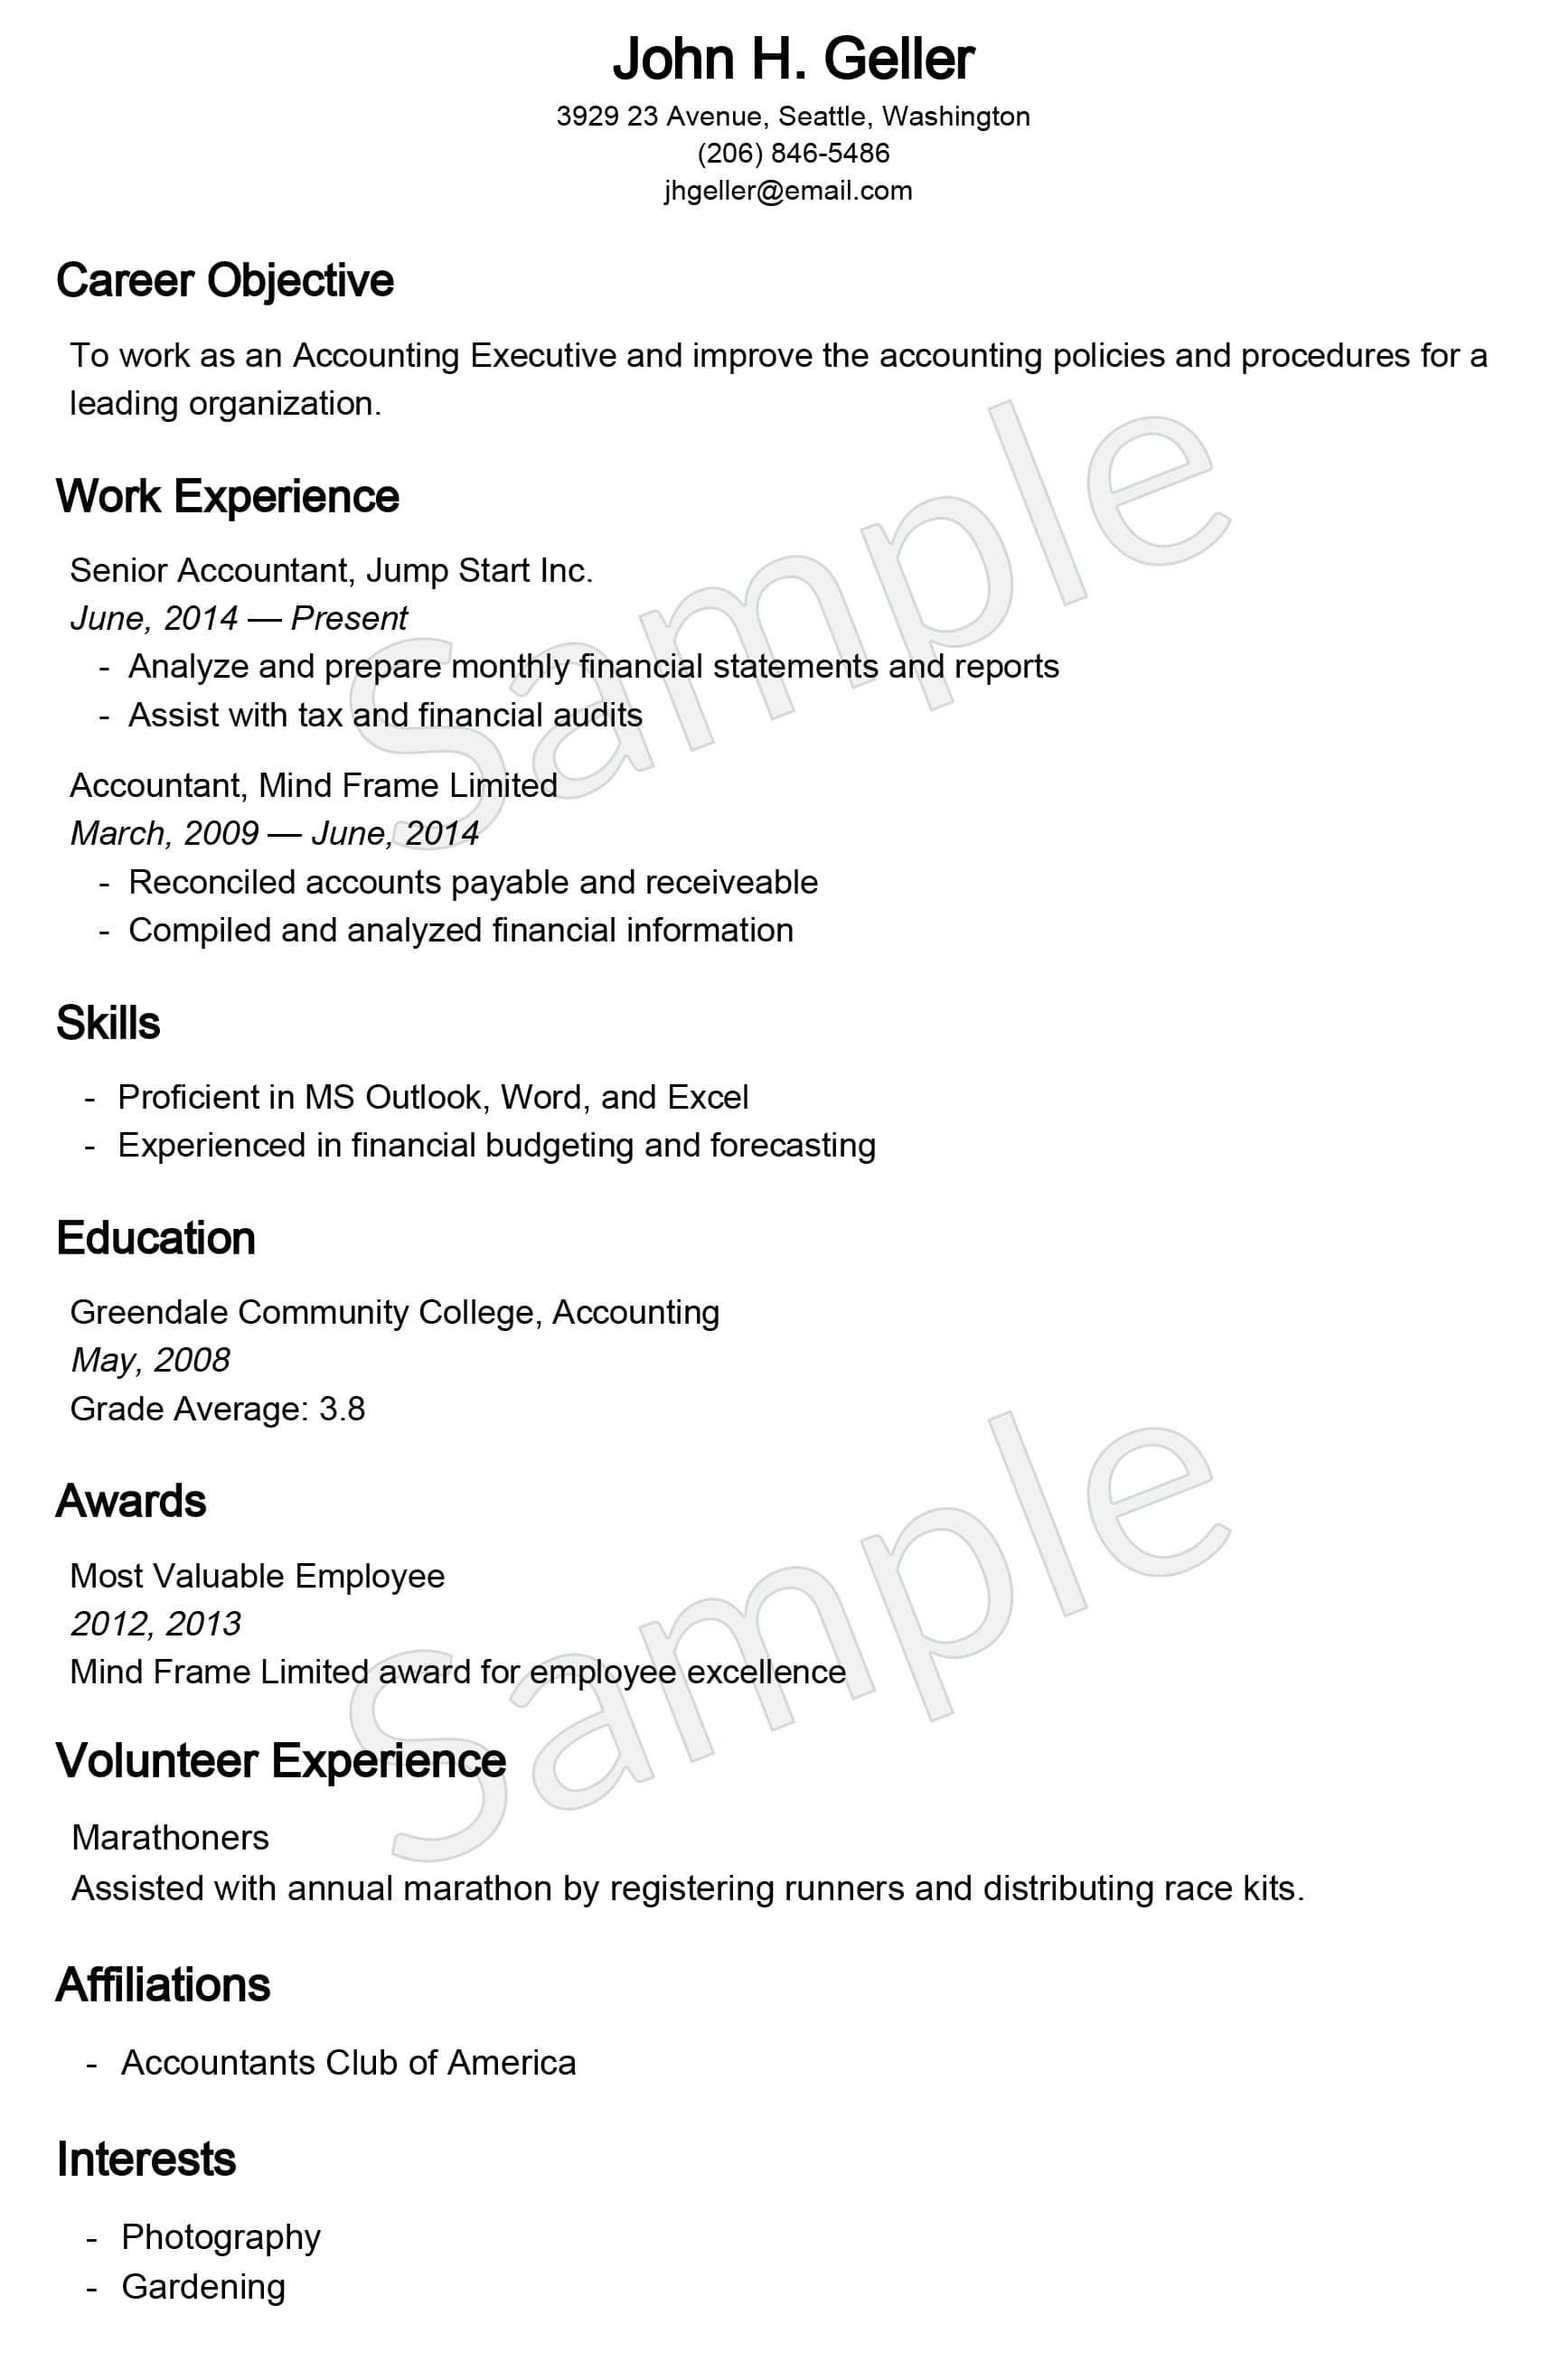 Resume Builder | Free Resume Template (US) | LawDepot | Resume ...